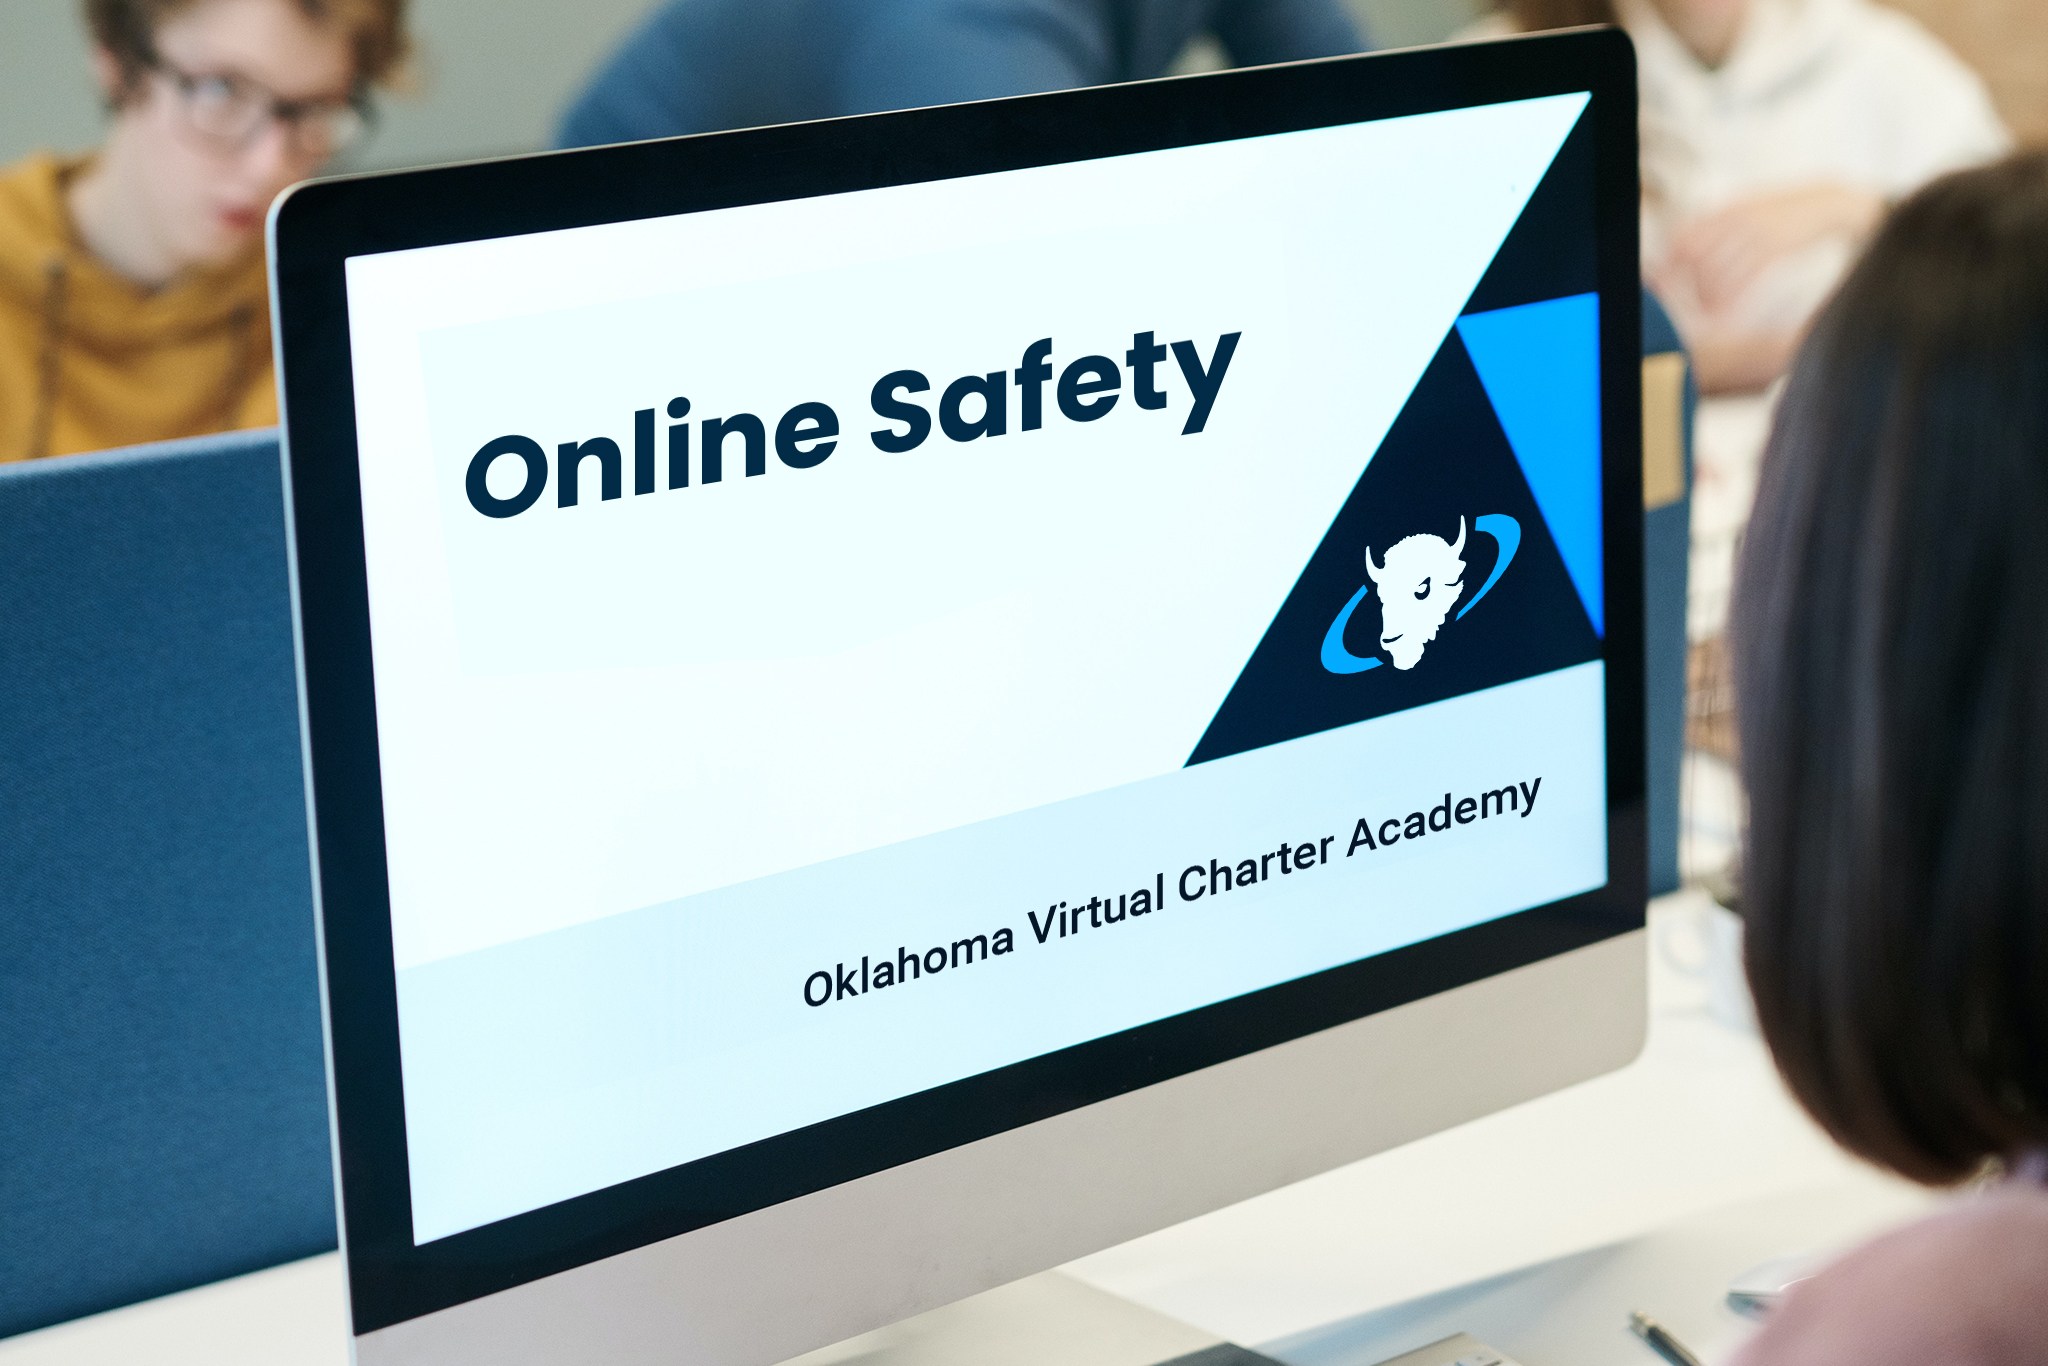 Oklahoma Virtual Charter Academy_Thumbnail